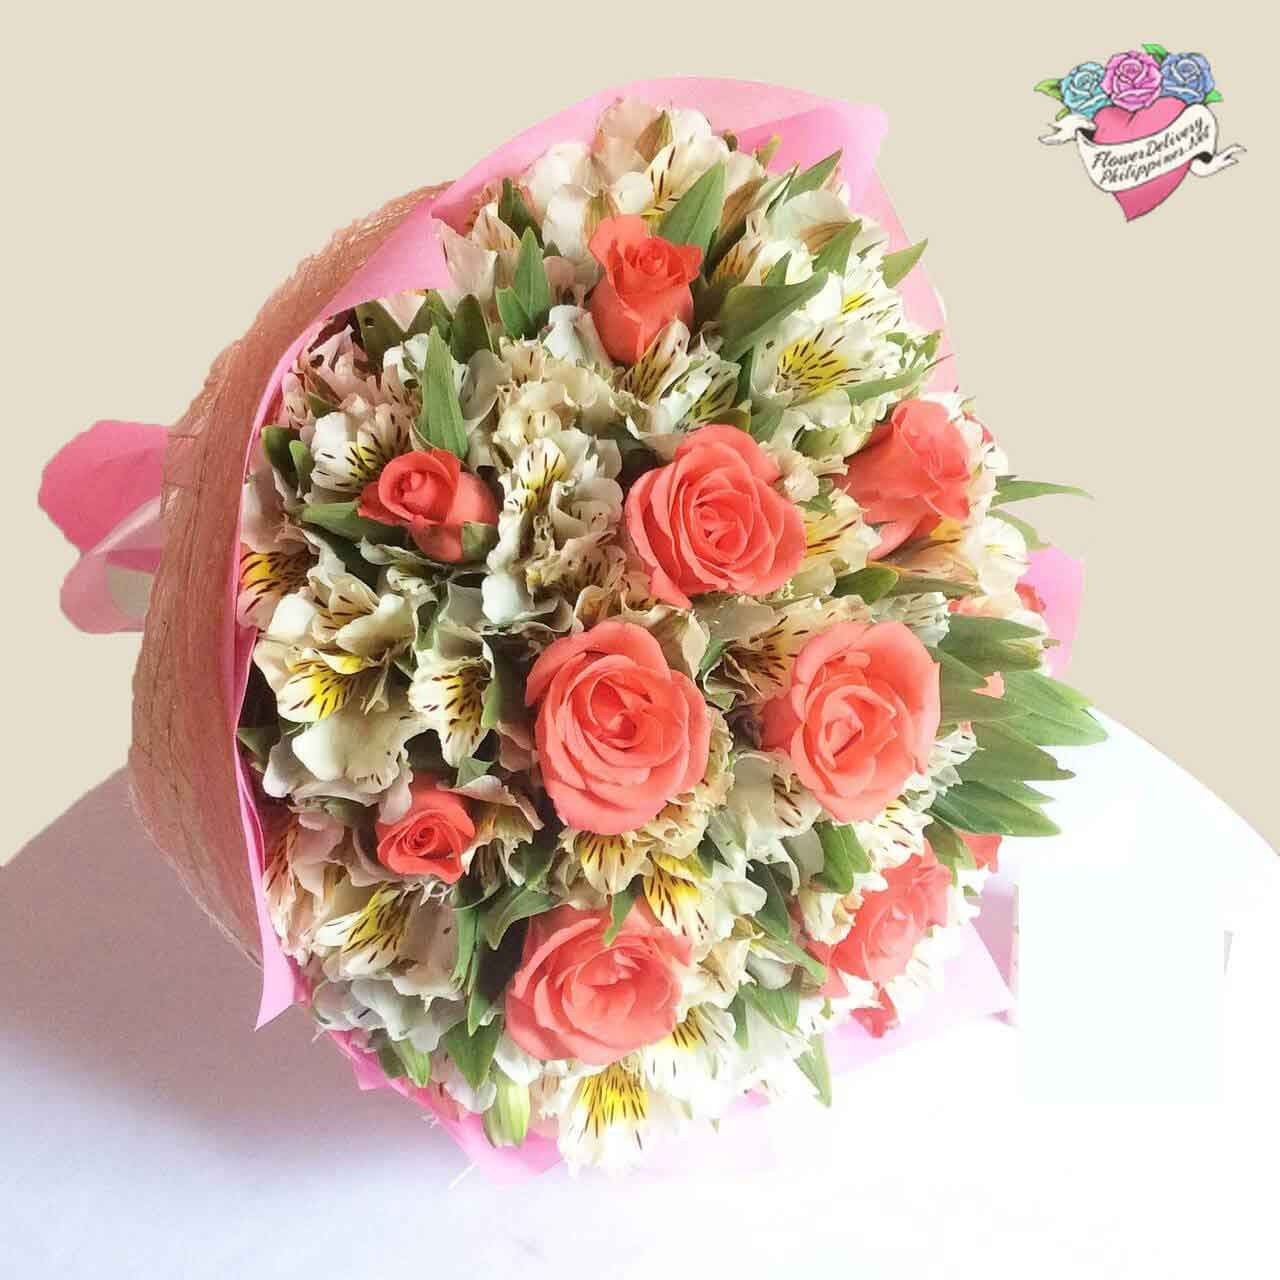 12 Pomelo Roses & Peruvian Lilies Bouquet - BEST SELLER!